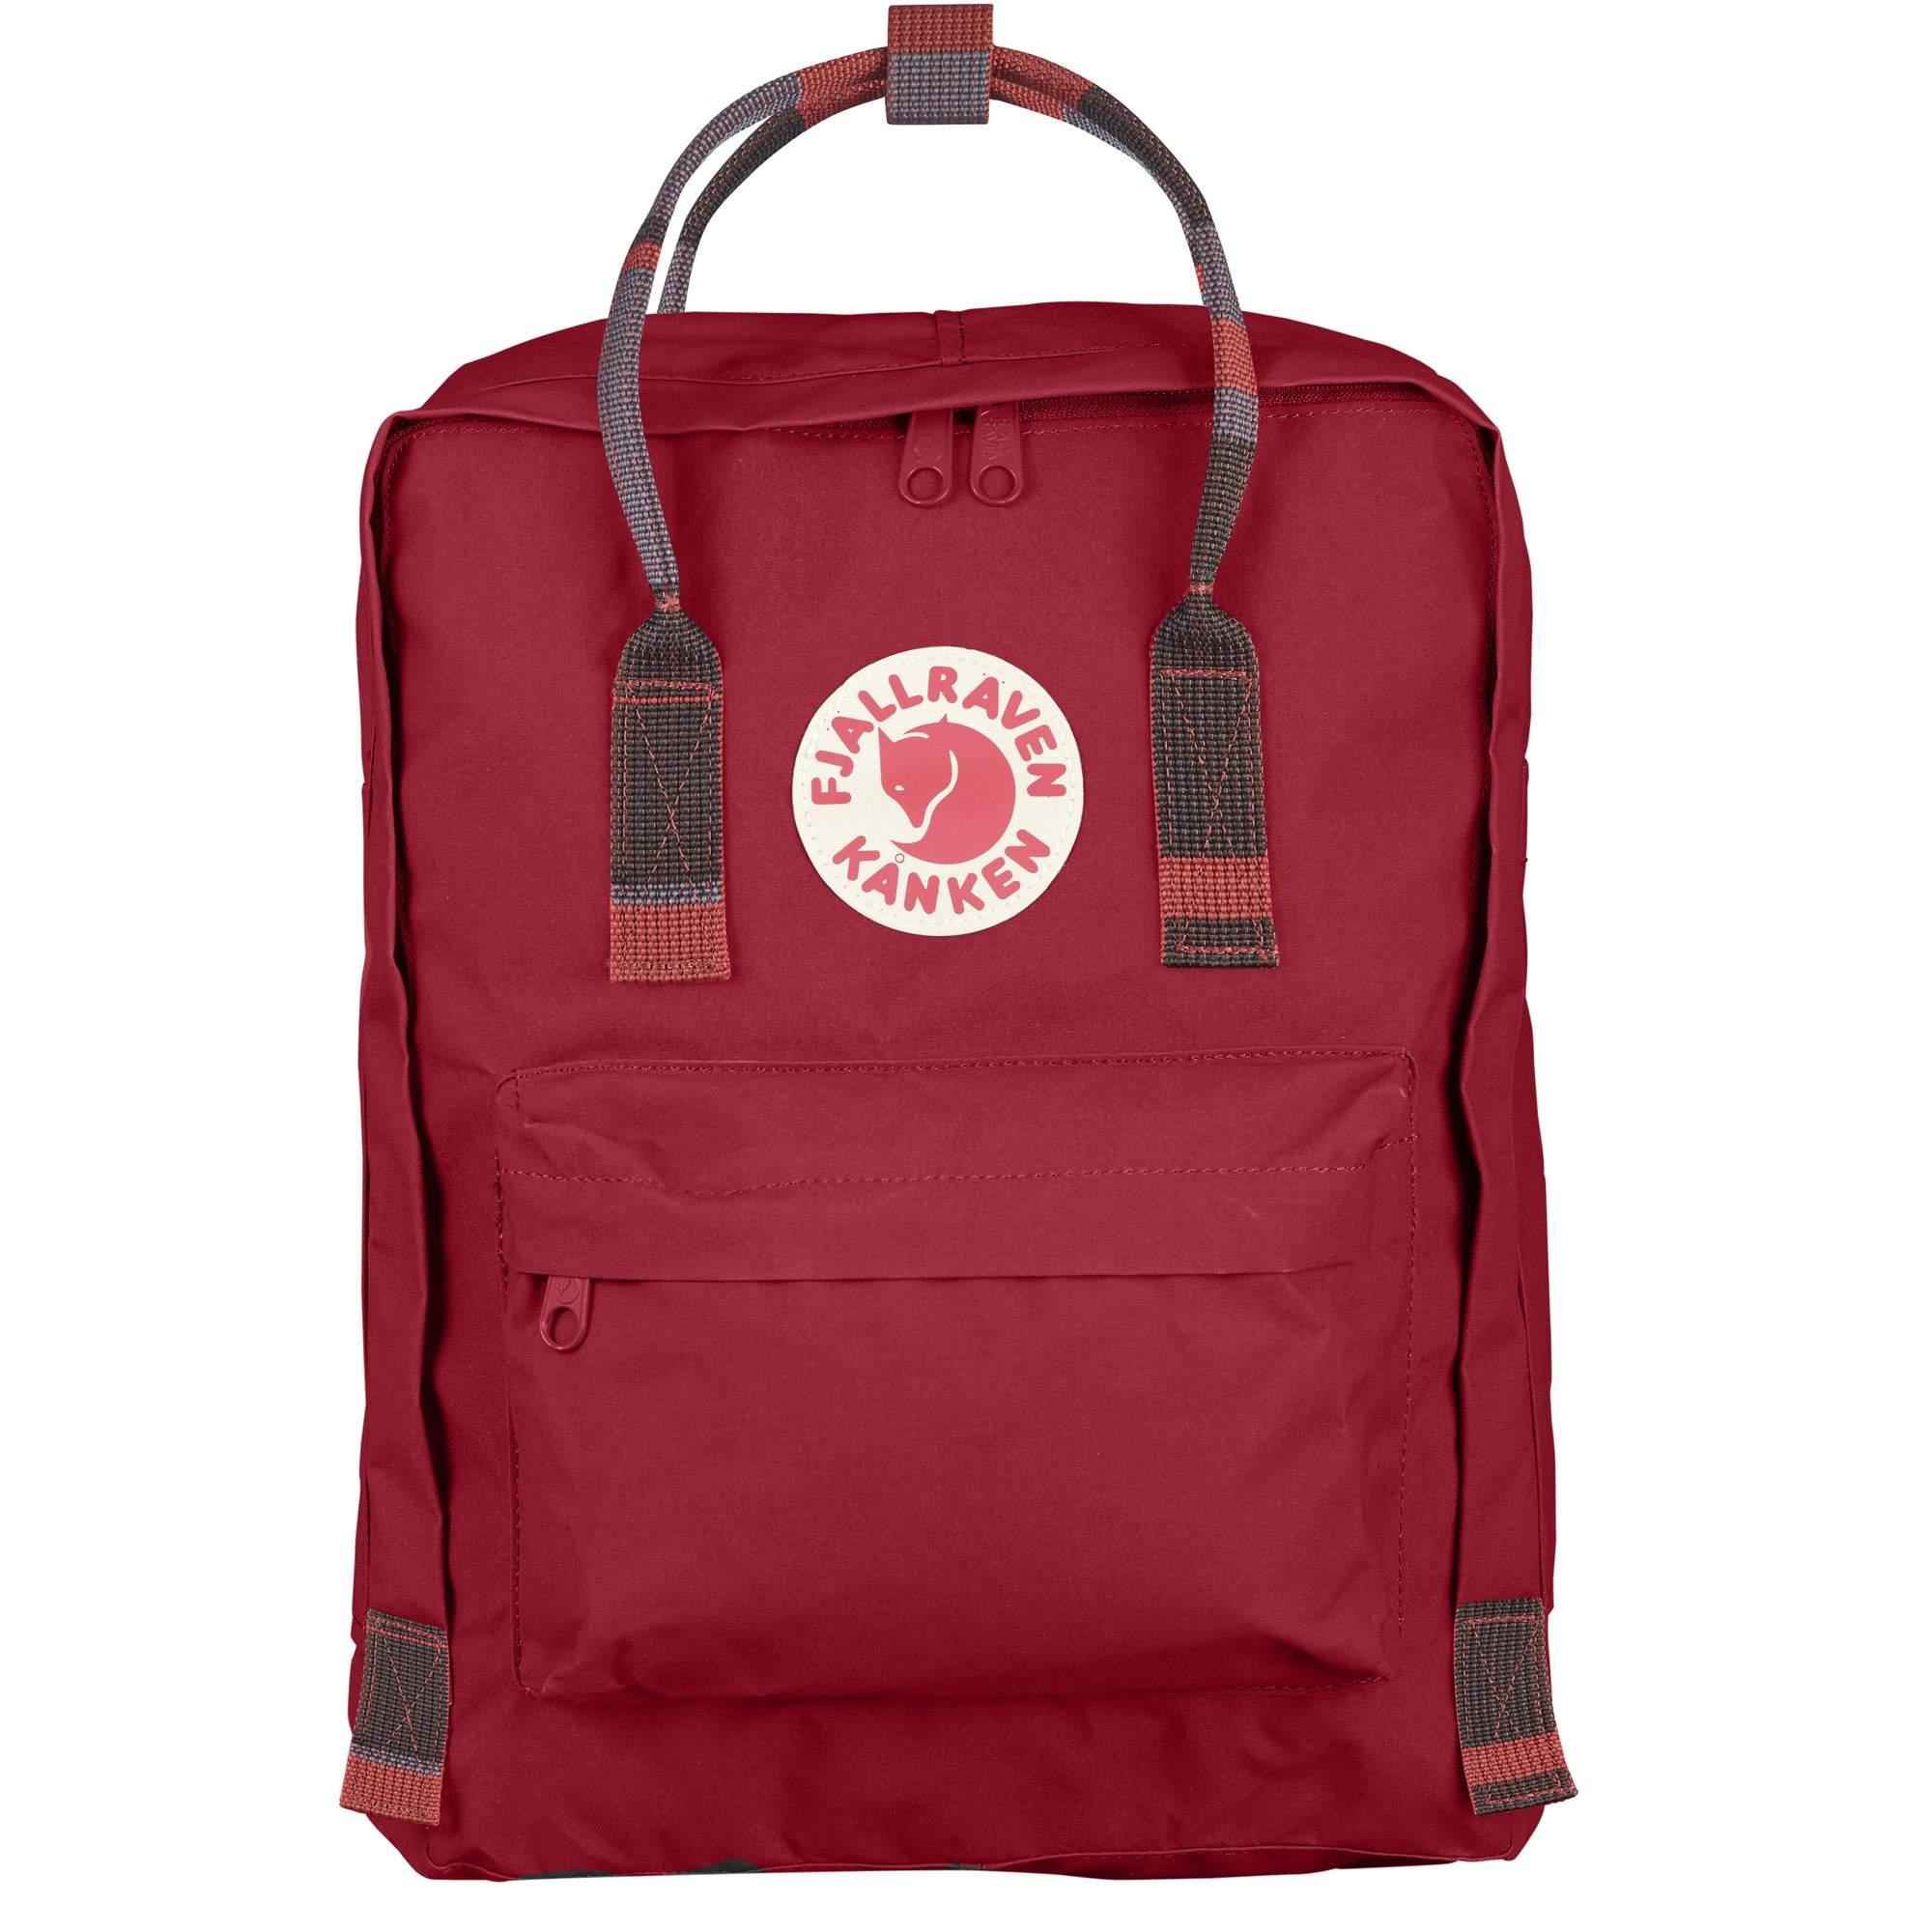 Fjallraven - Kanken Classic Backpack for Everyday - Deep Red